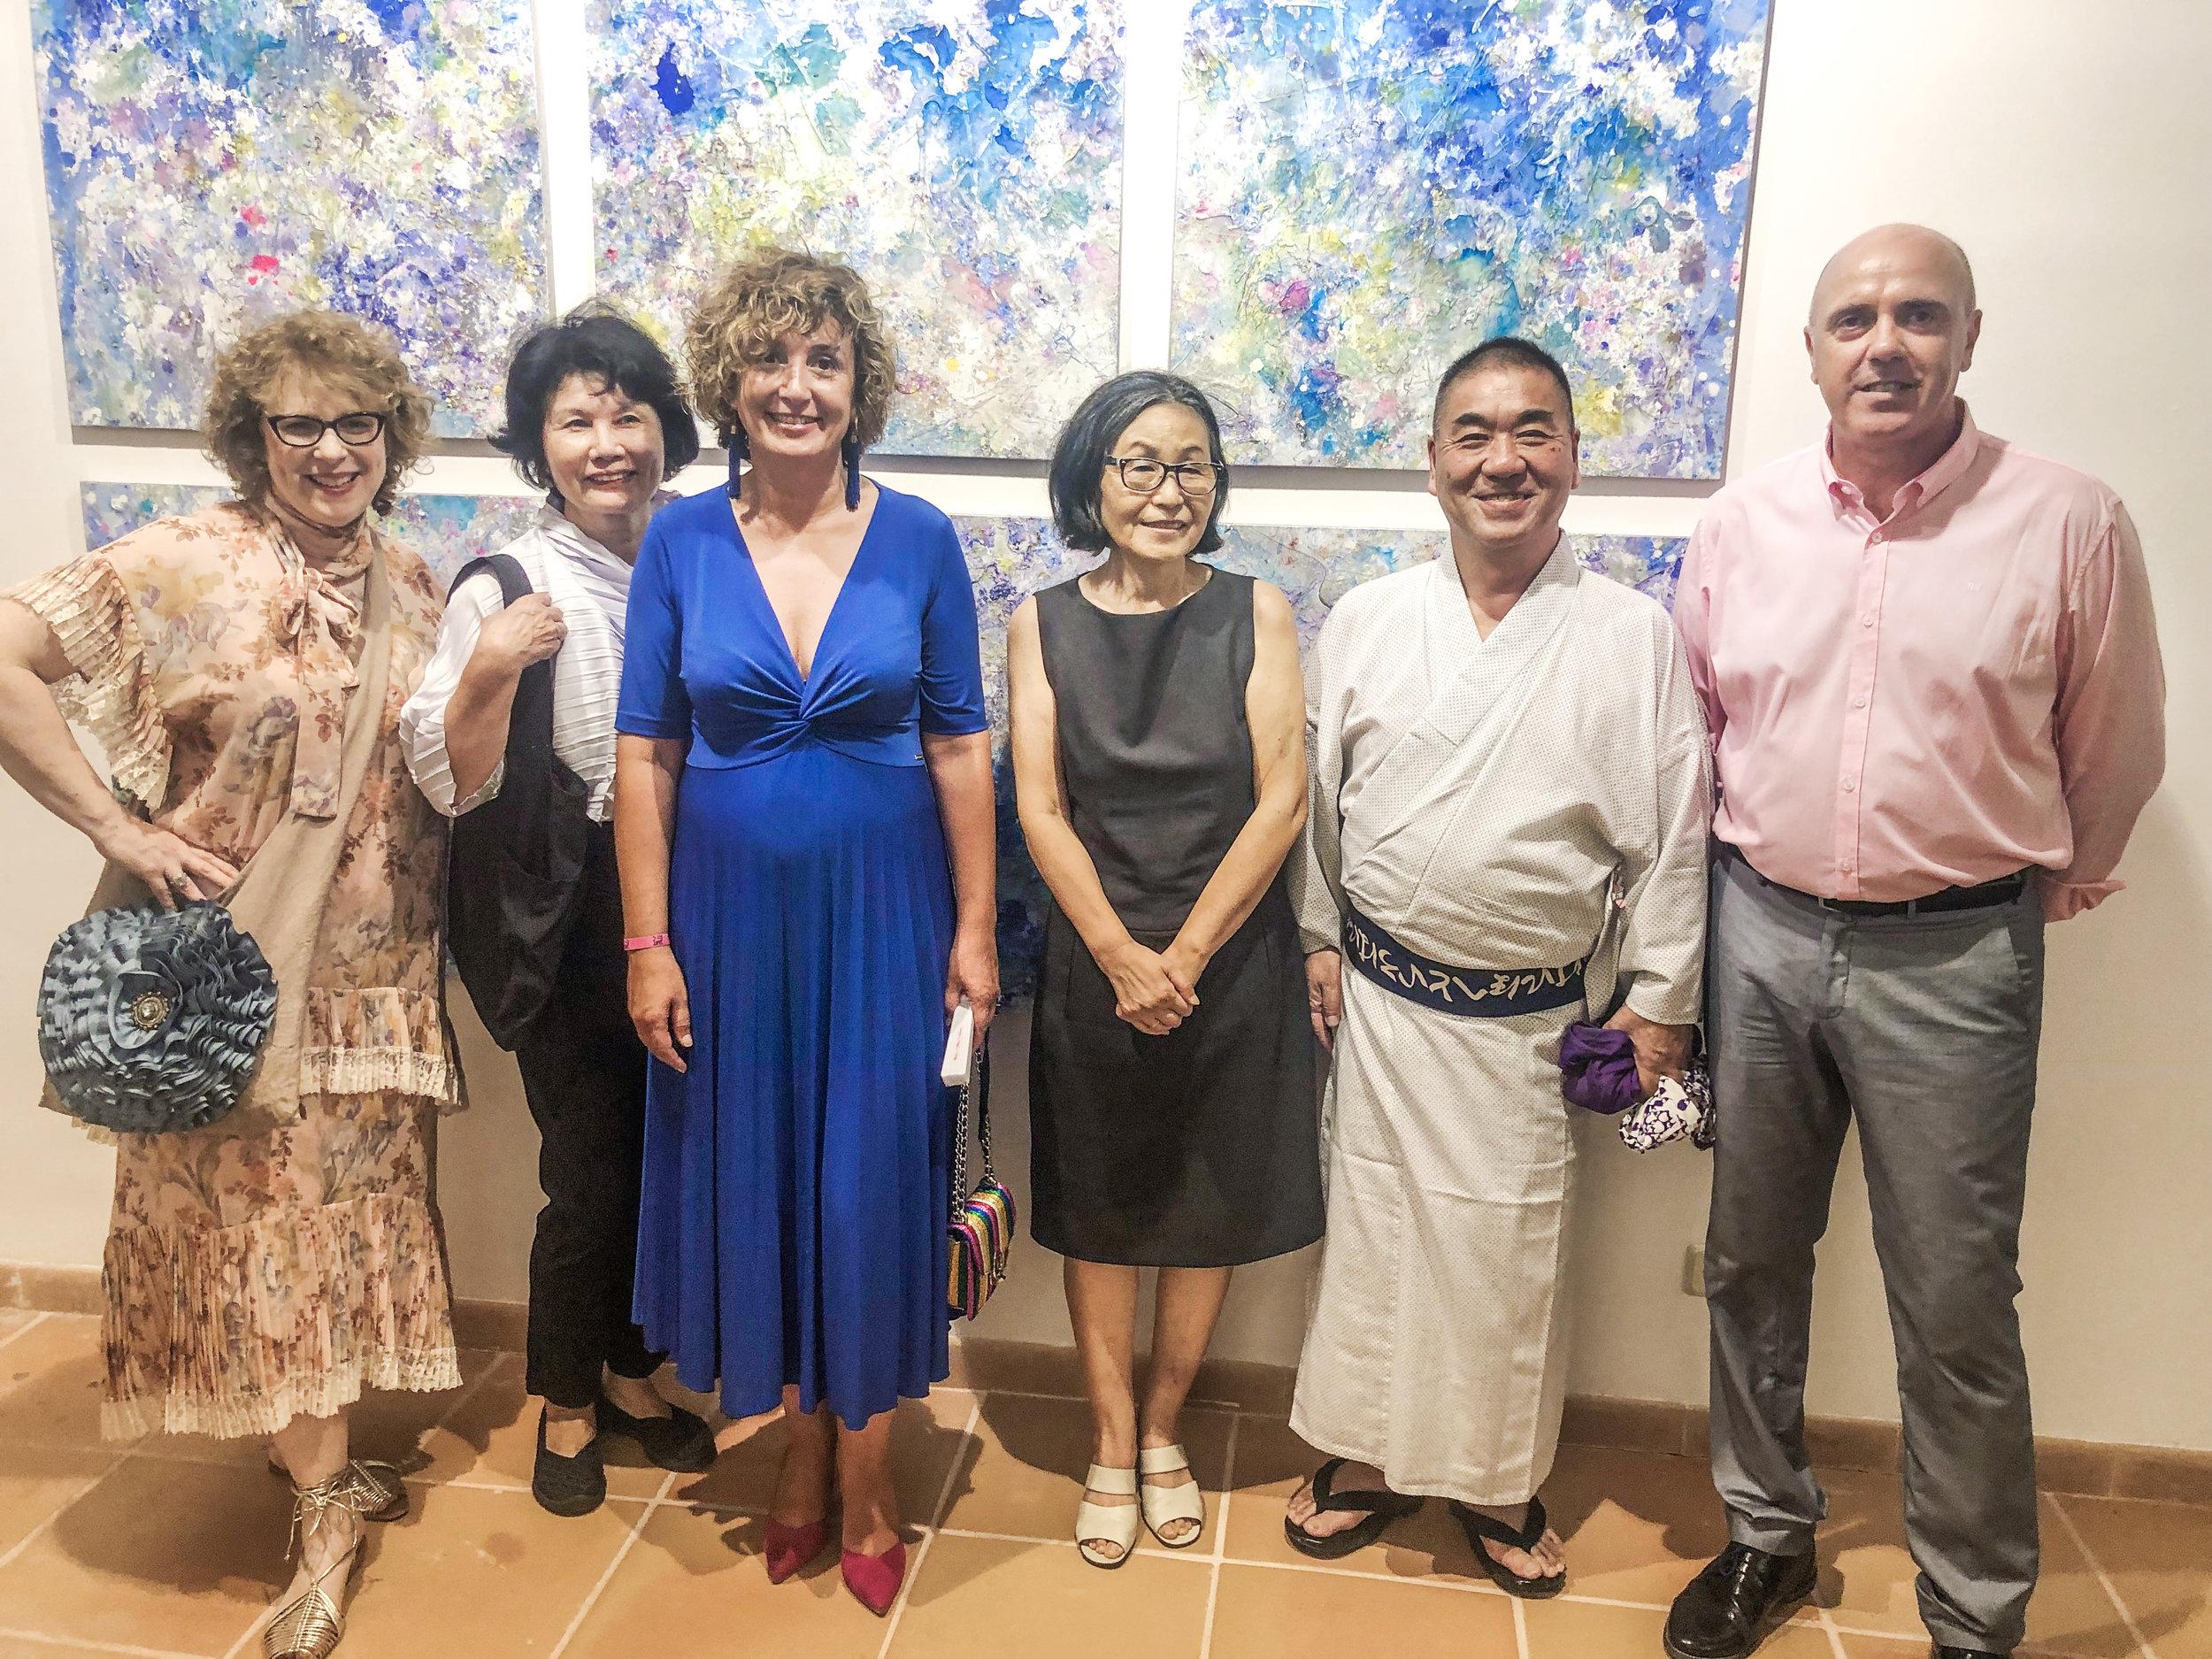 From left to right: Jill Krutick; Hisako Kobayashi; Francisca Mora Veny, Mayor of Porreres; Kumiko Okamoto-Paulisch; Tatsuya Kubota; Gaspar Móra Mulet, Minister of Tourism & Culture, Porreres